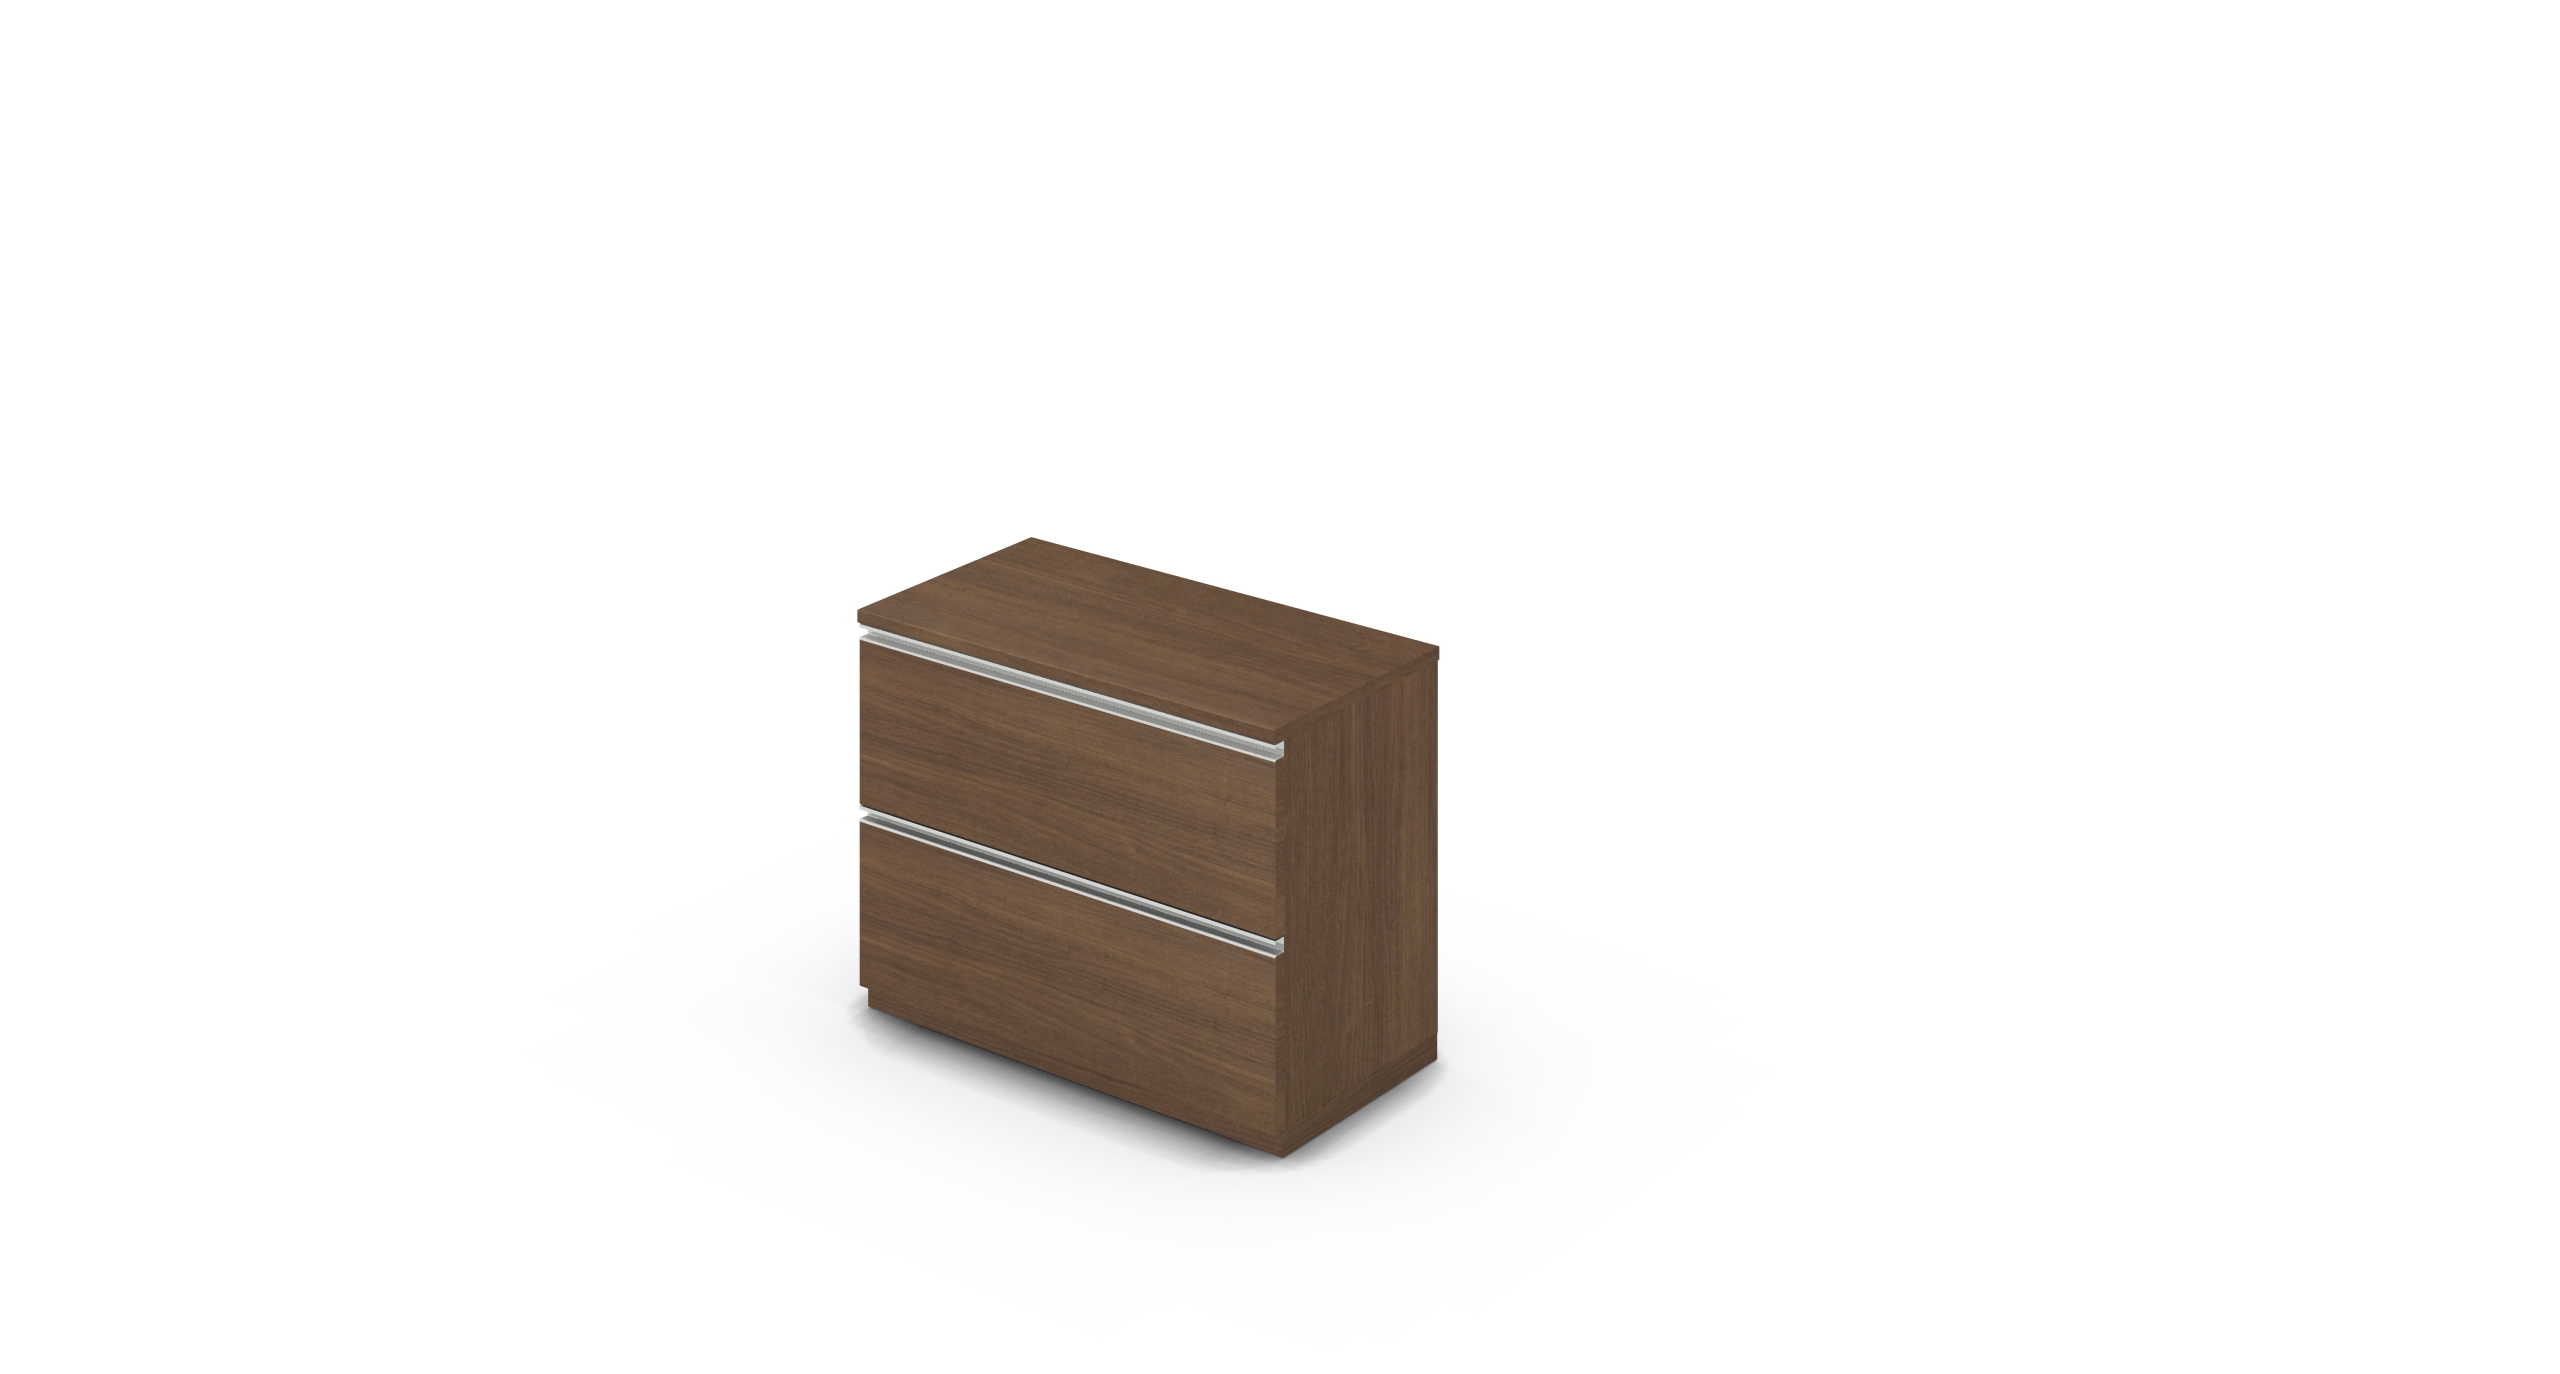 Cabinet_900x450x775_DR_Walnut_Rail_NoCylinder